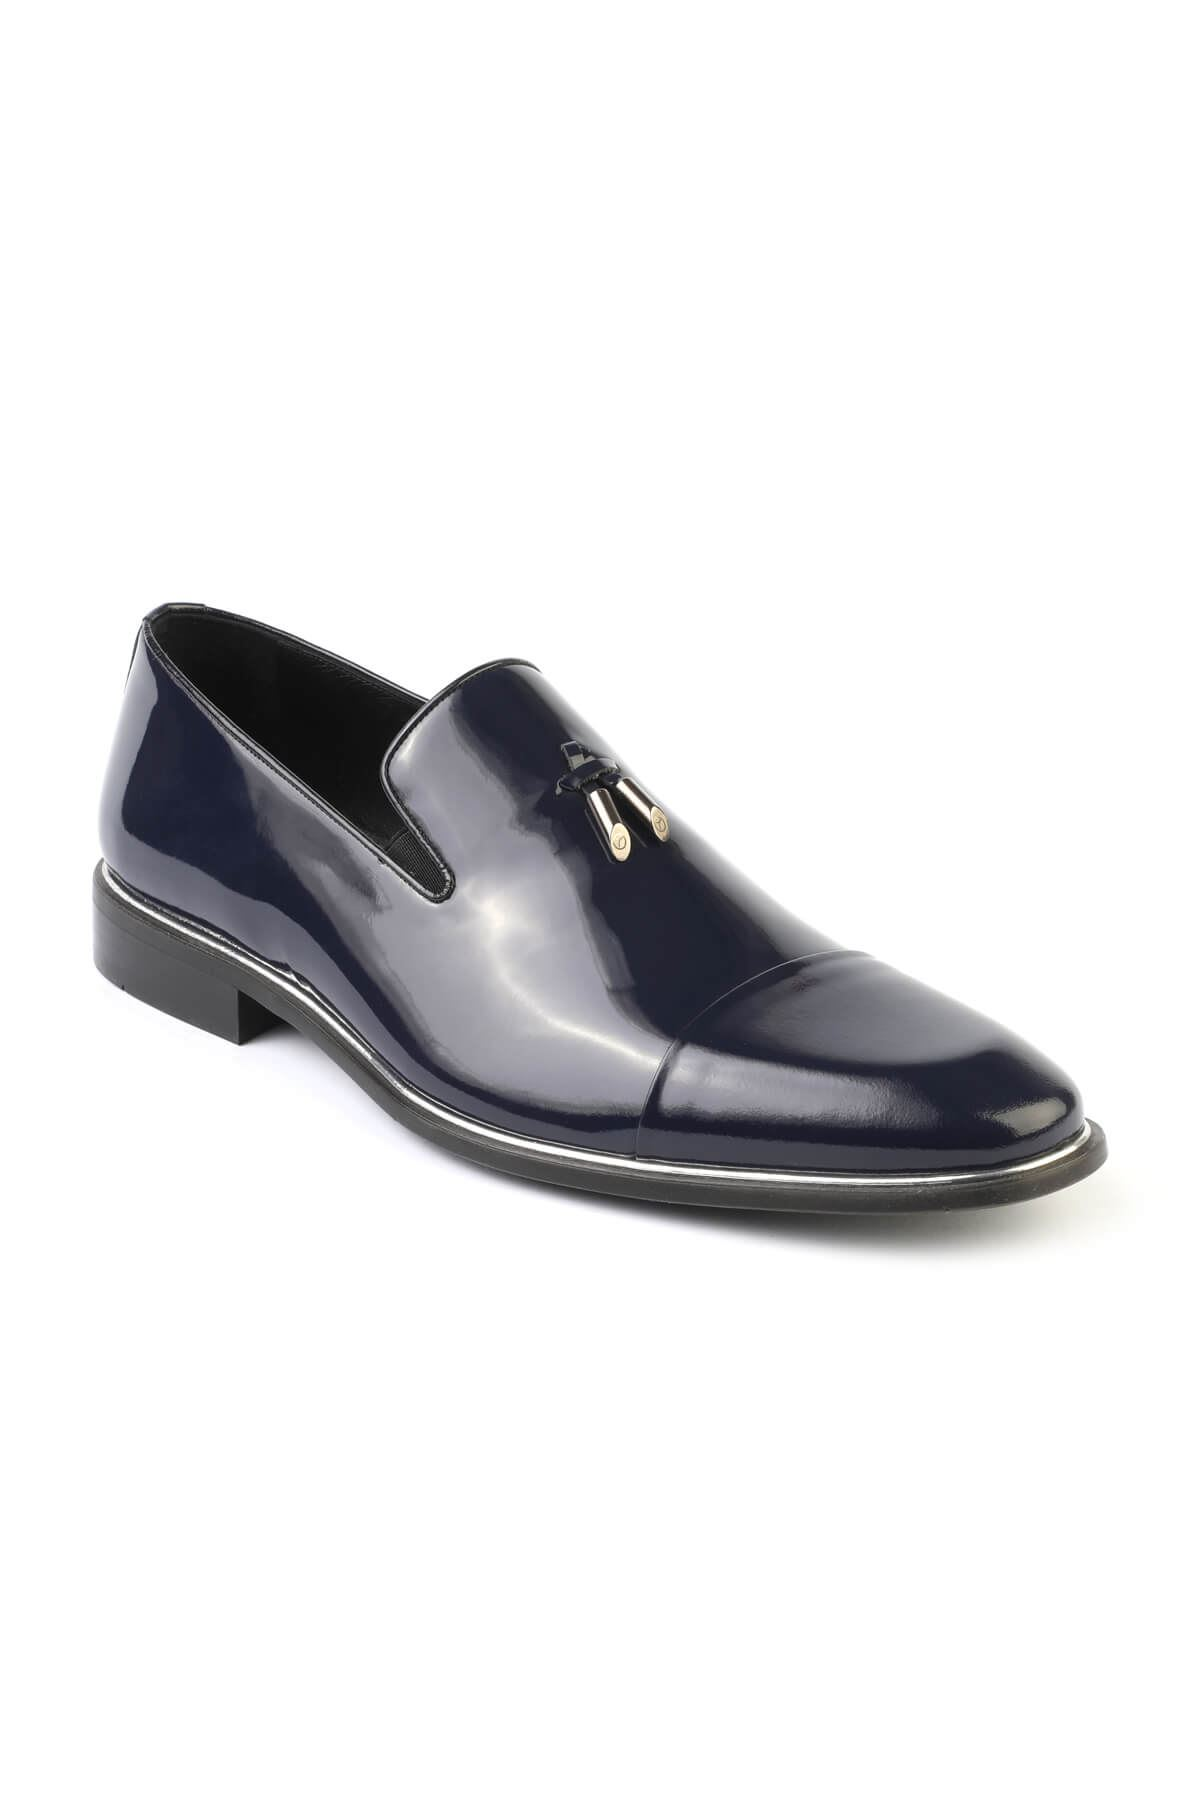 Libero T851 Navy Blue Classic Shoes